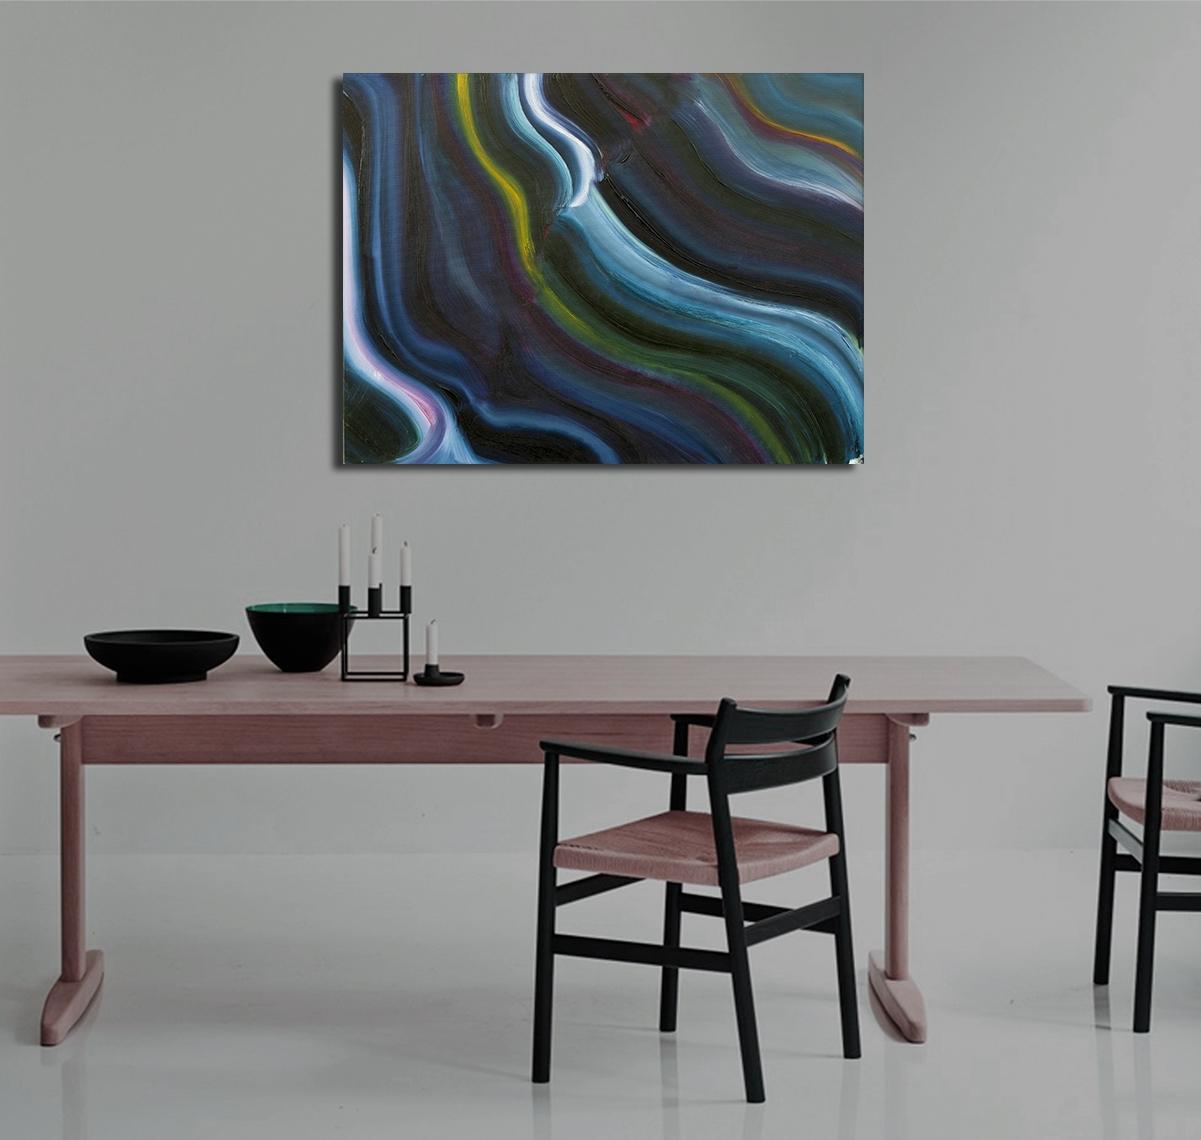 Opera minimal astratta neon olio su tela